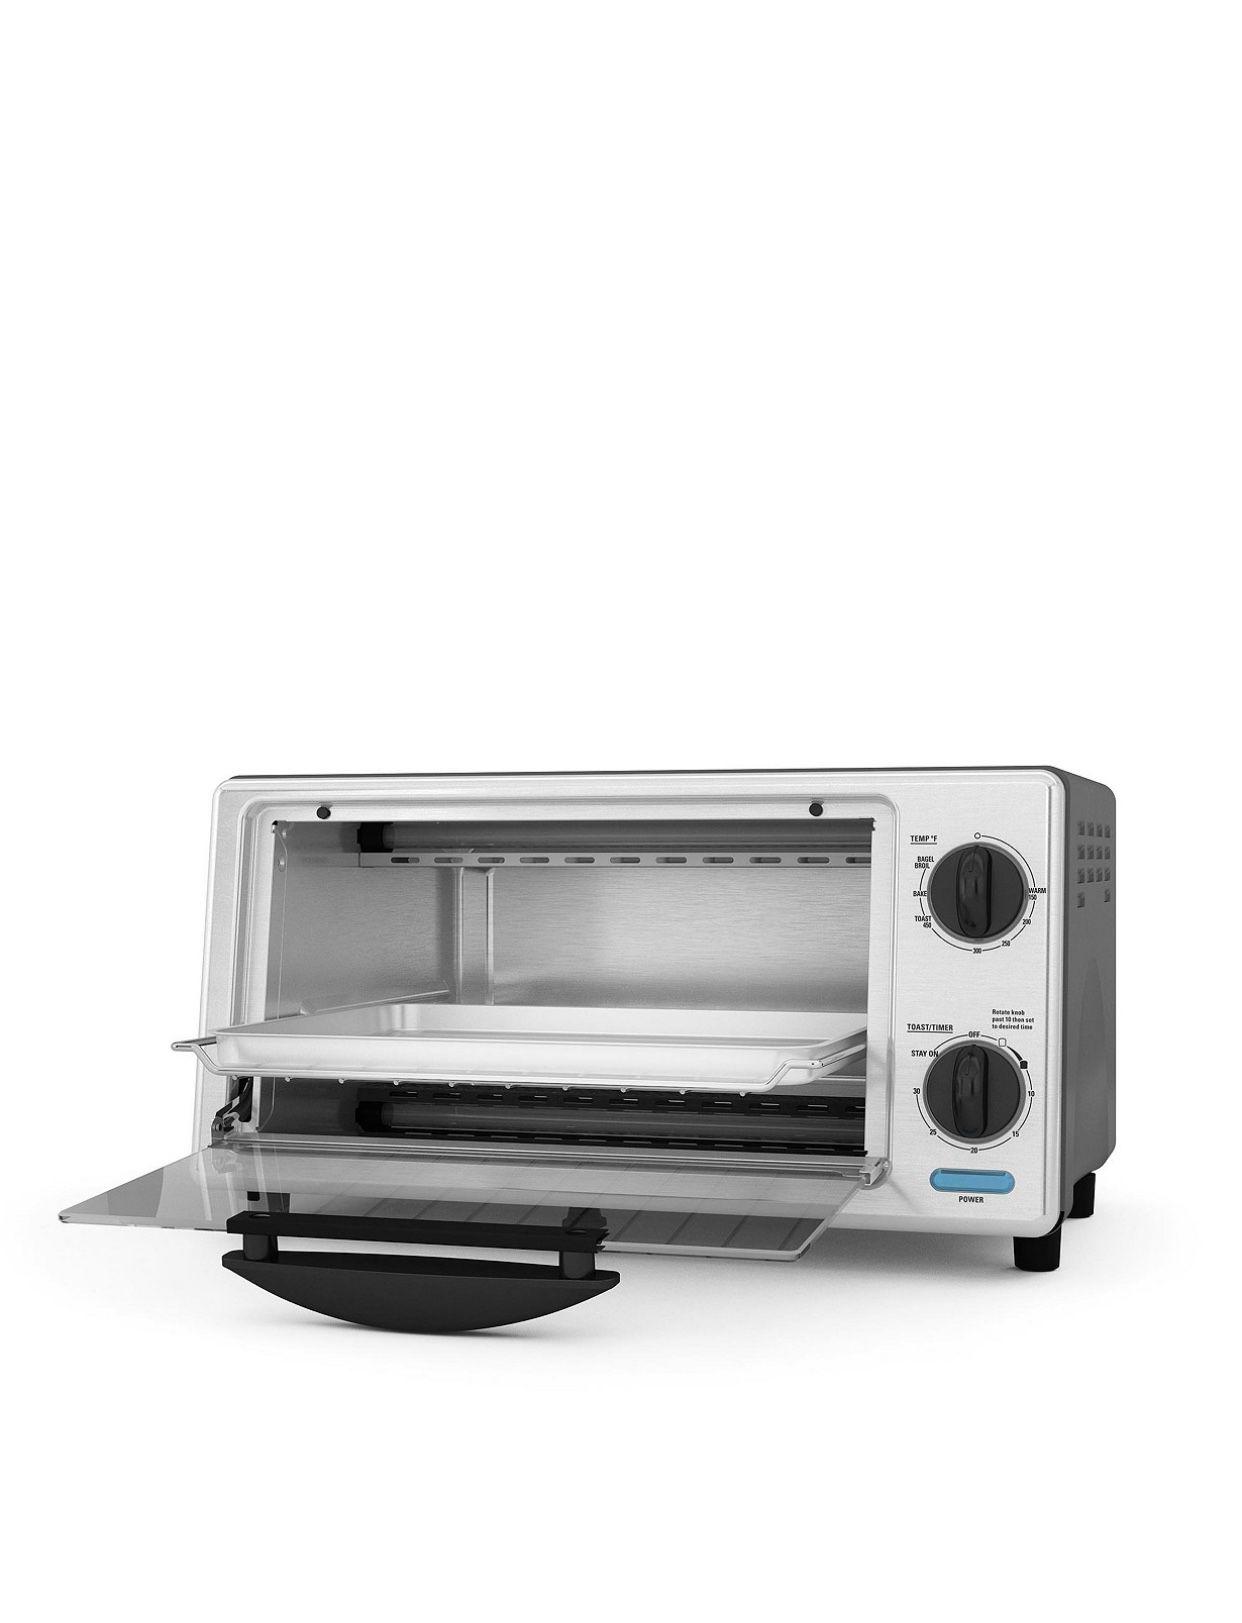 Bella Toaster Oven